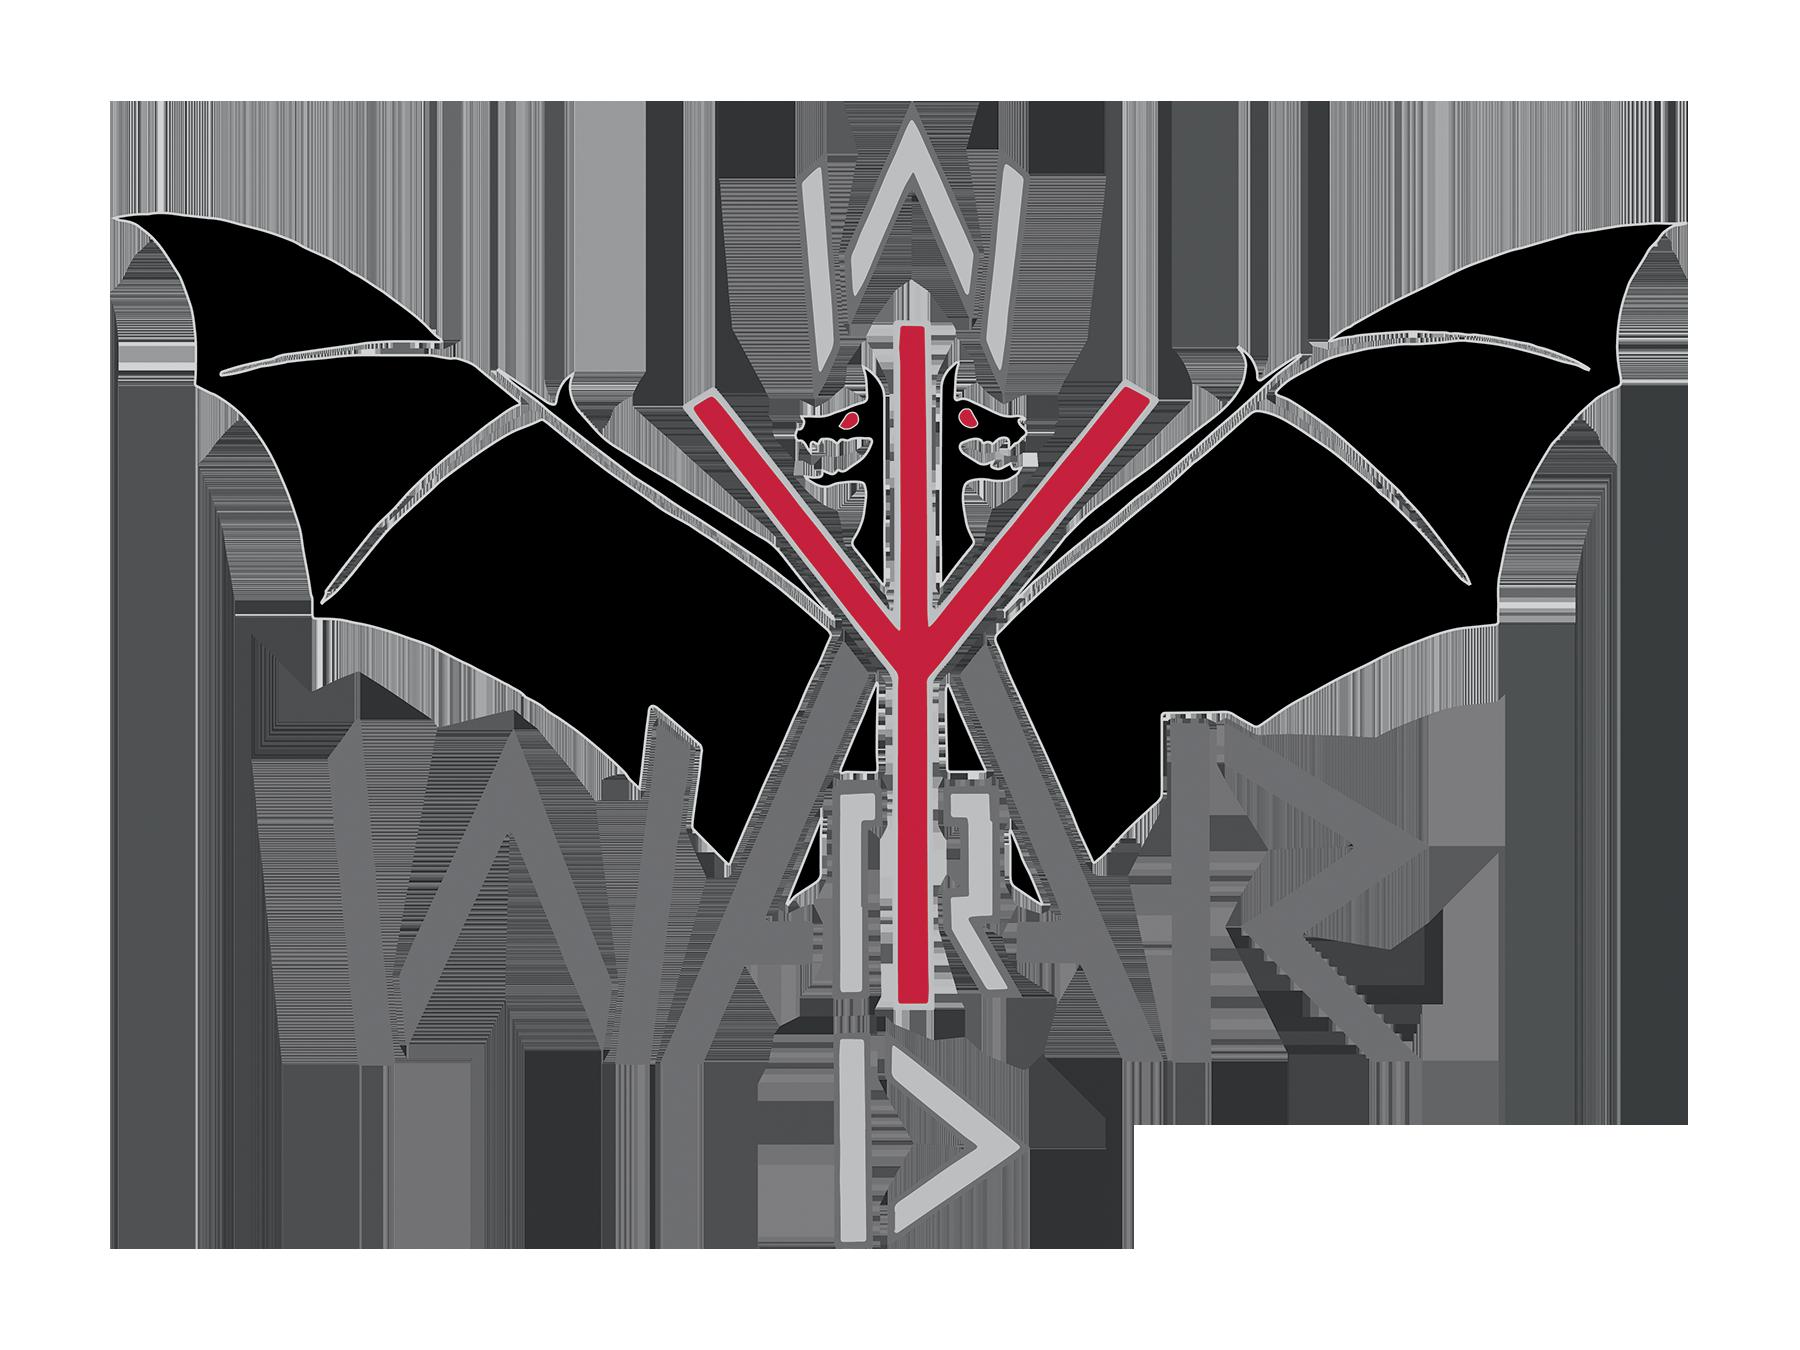 WYRD WAR slide